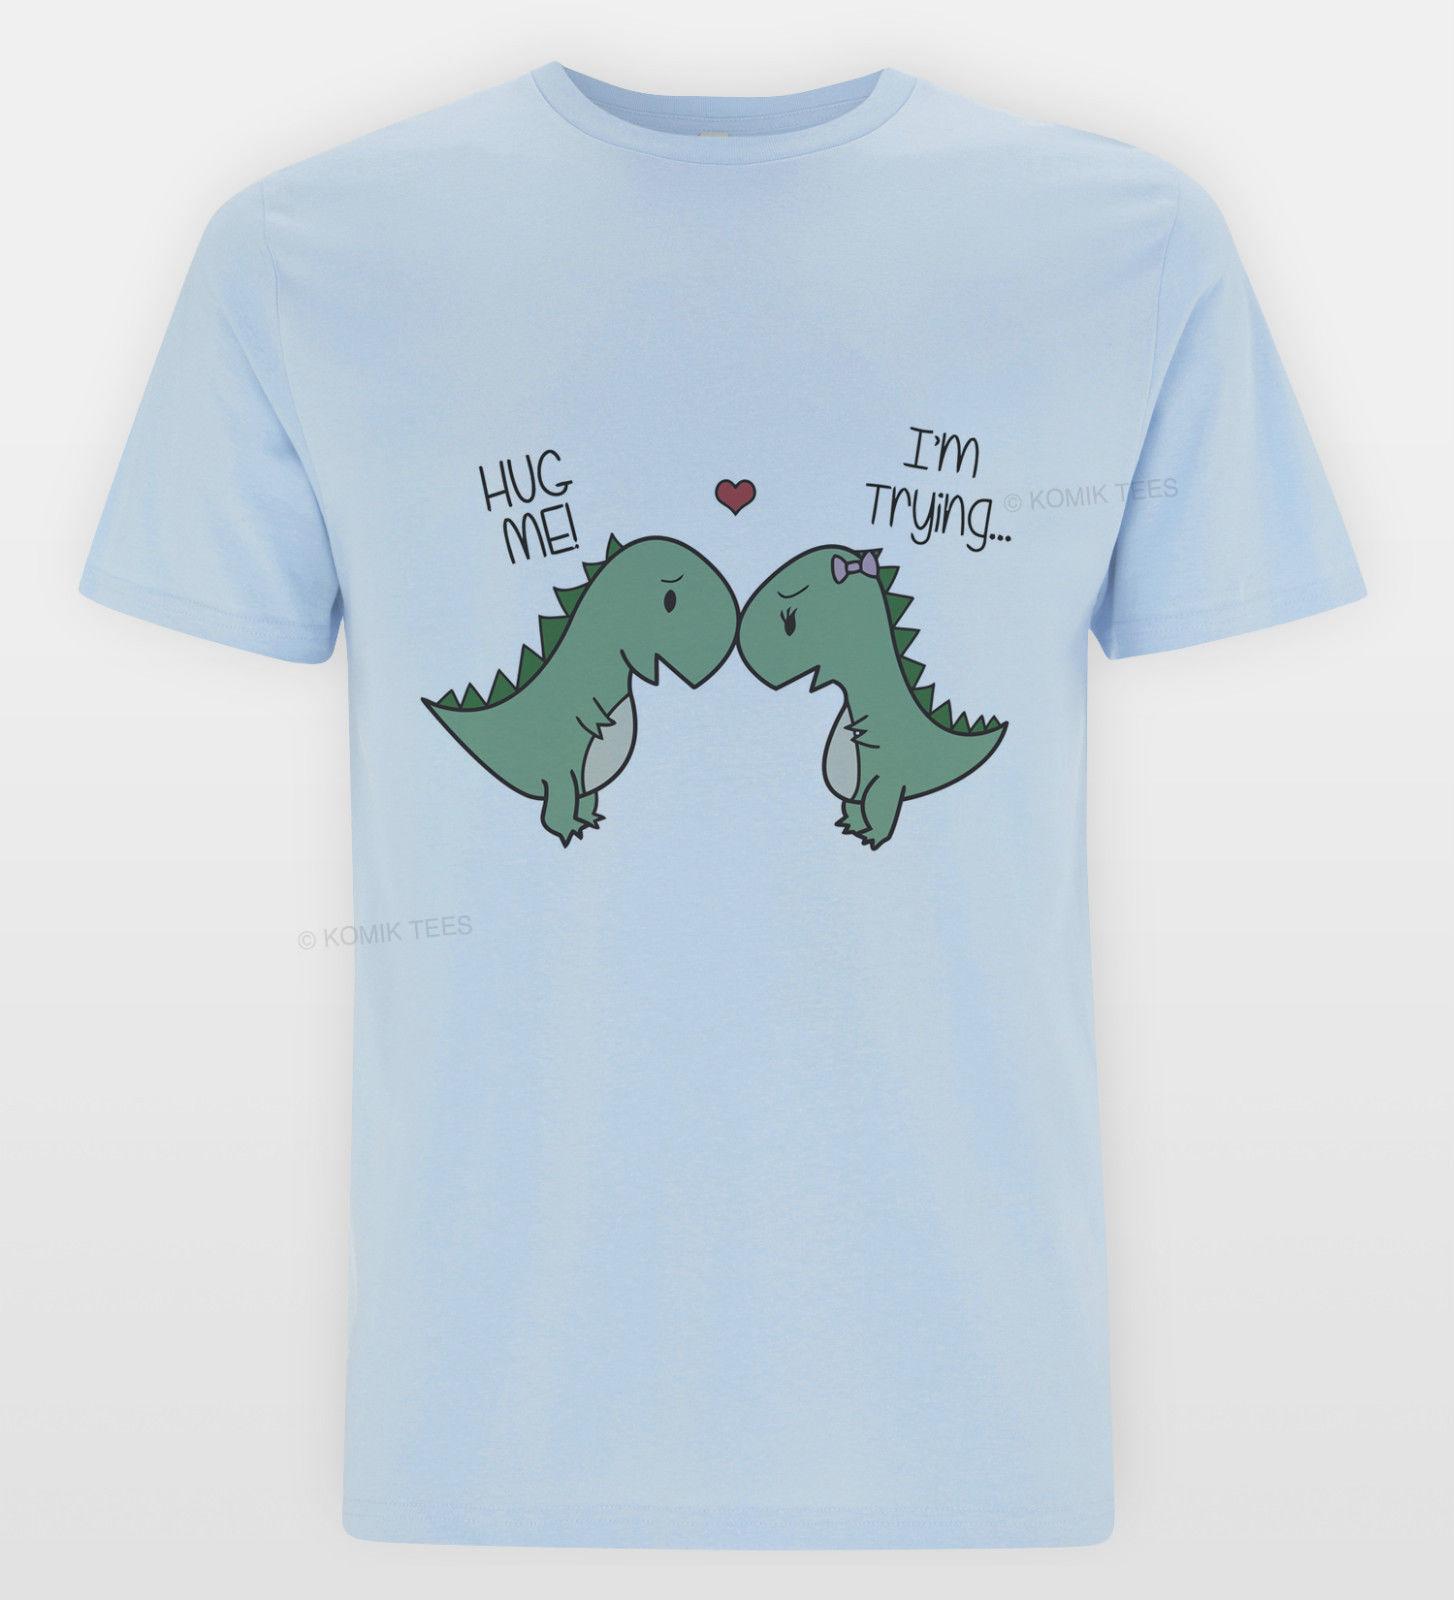 e5c25fab T REX Hug T Shirt Funny Dinosaur Cute Tee Indie Tumblr Sketch Funny Rex Top  Cartoon T Shirt Men Unisex New Biker T Shirts Make Your Own T Shirts From  ...